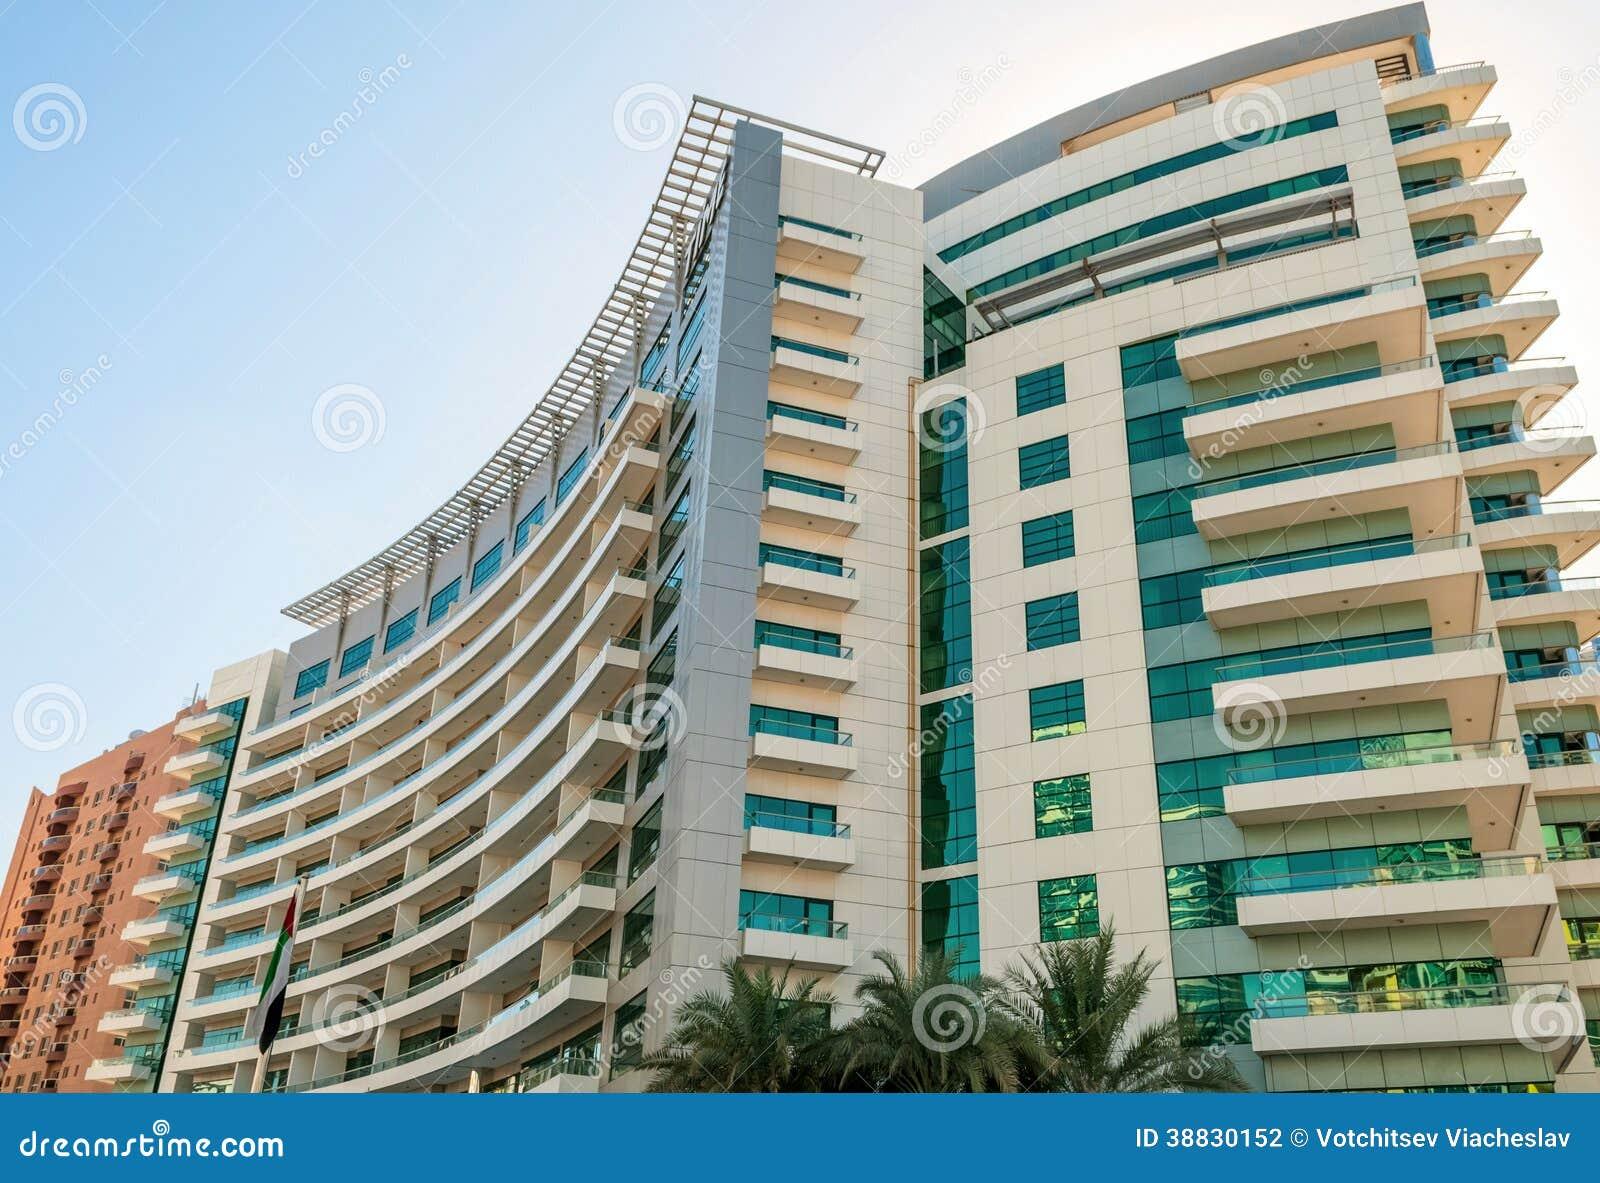 Luxury hotel in dubai editorial photography image 38830152 for Posh hotels in dubai